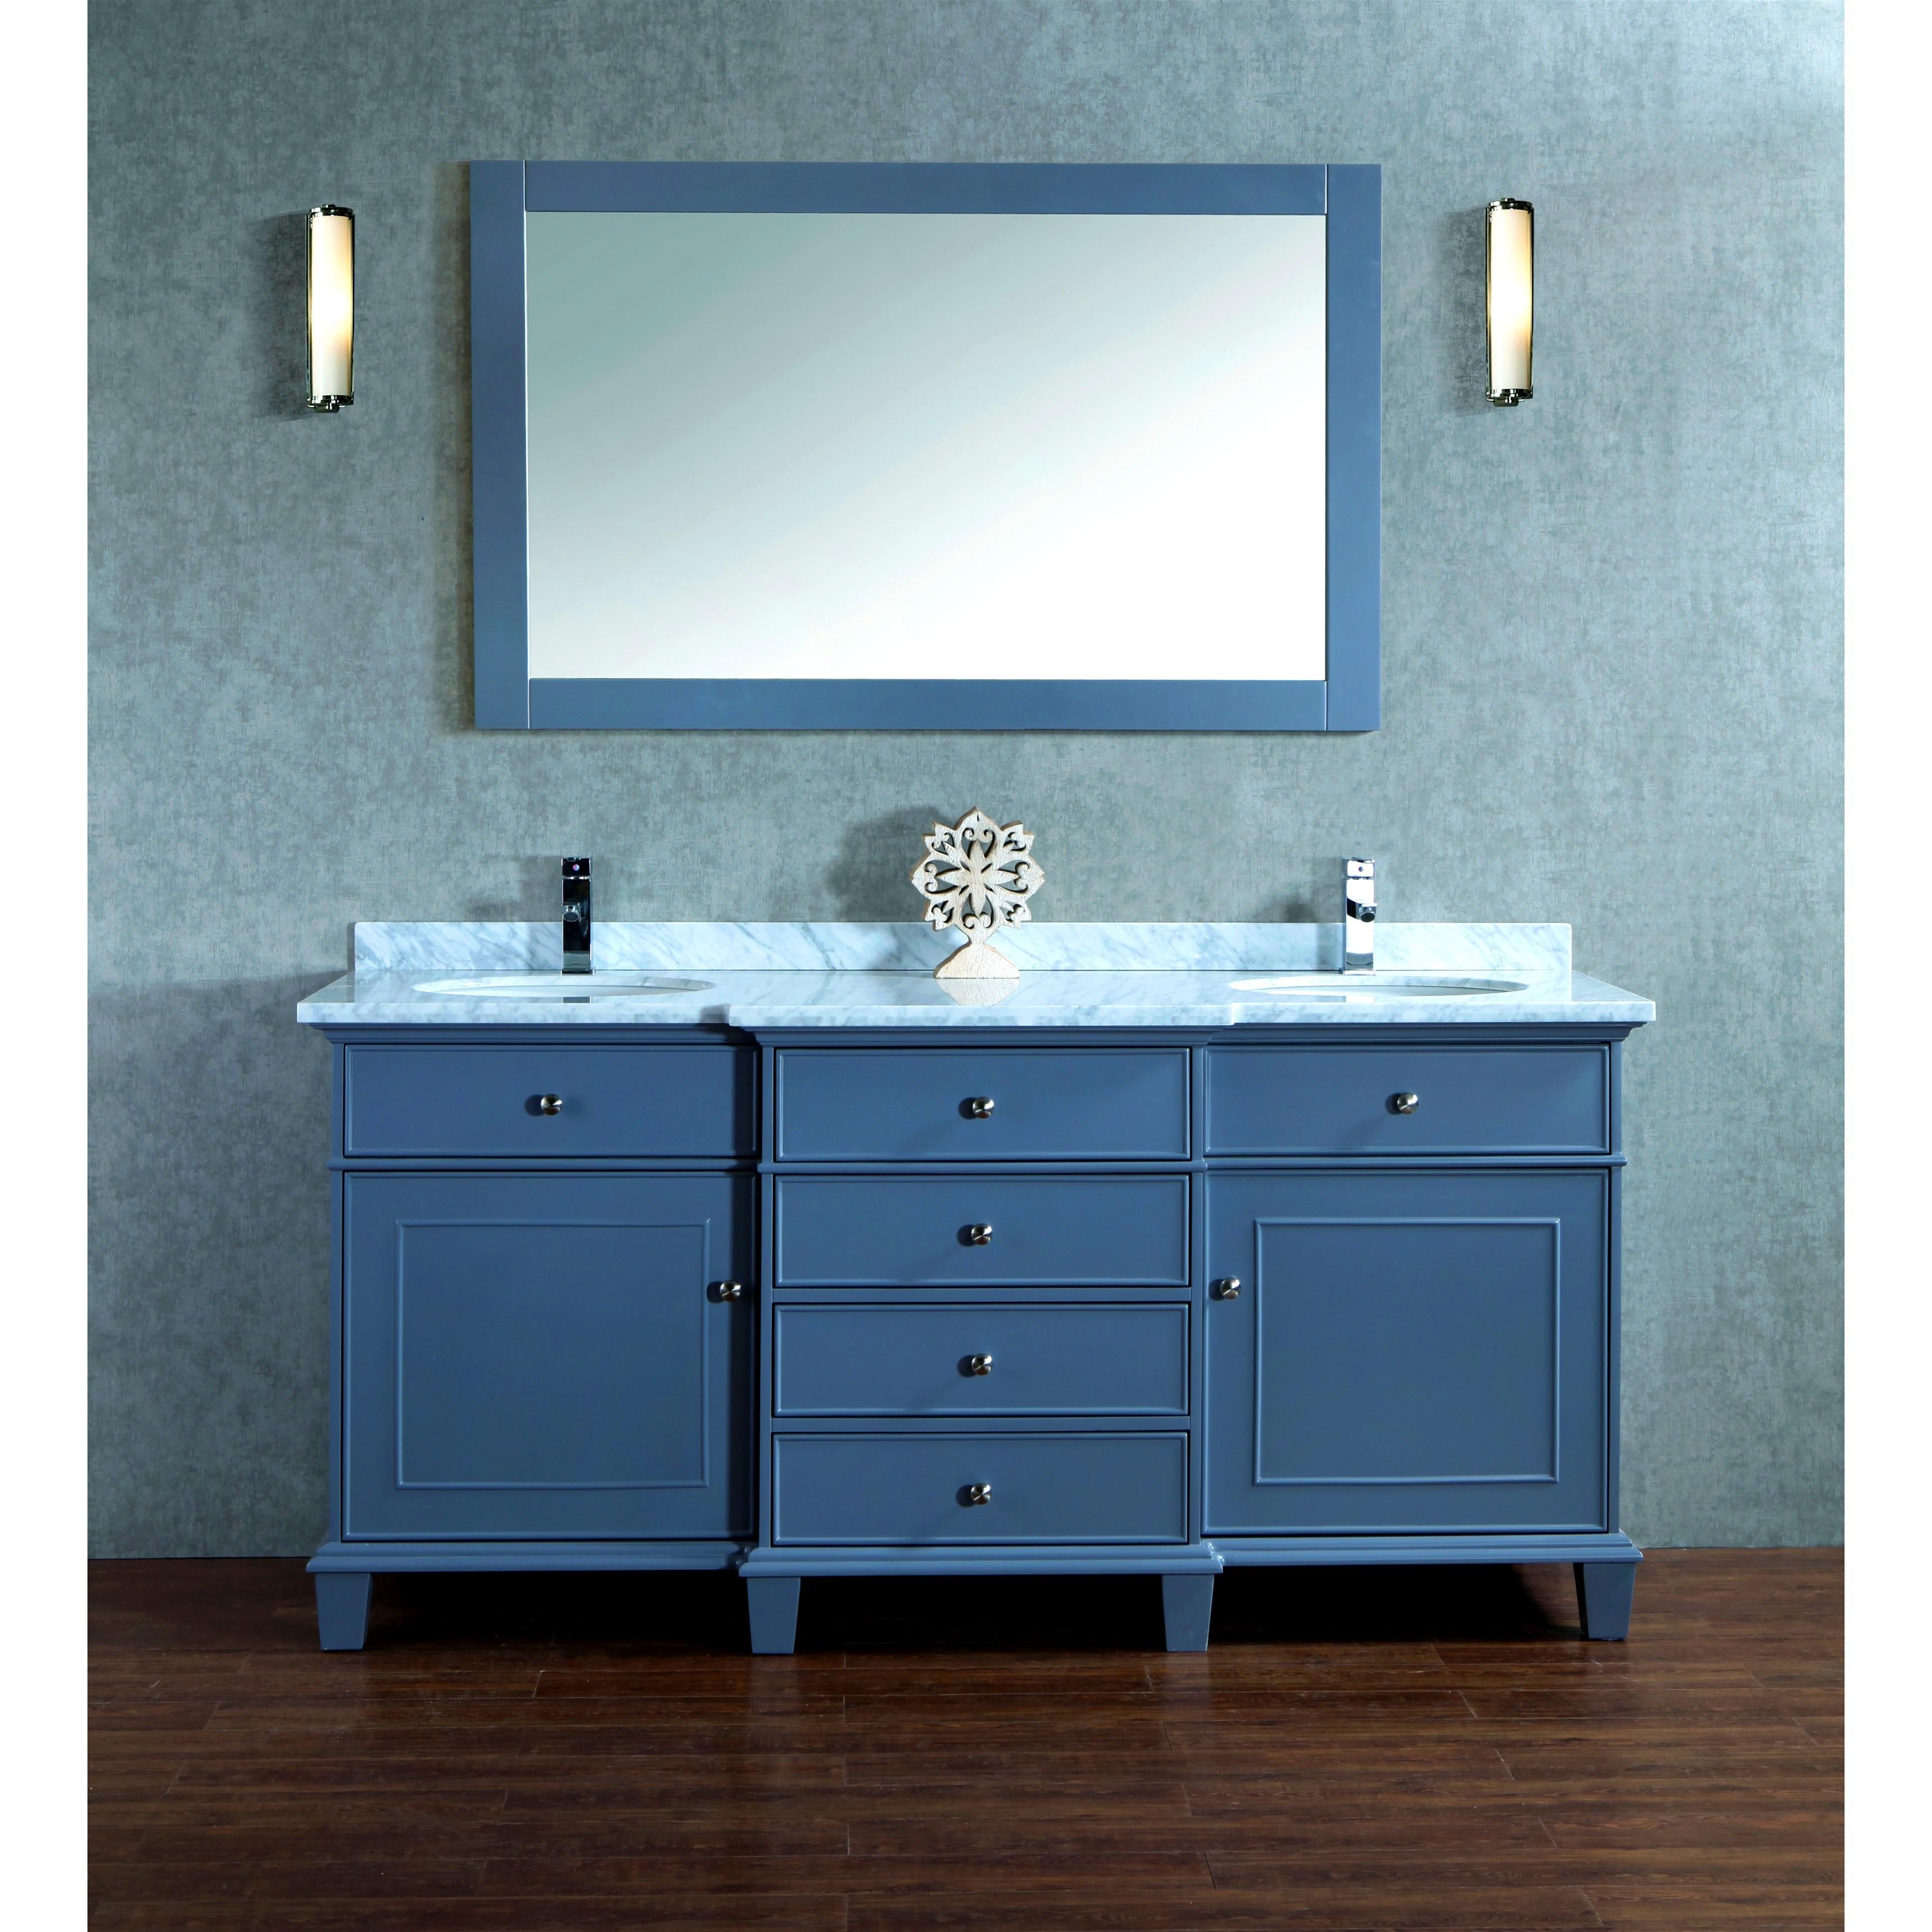 cheap vanity tops bath lowes bathroom vanities narrow sinks inch depth ikea clearance